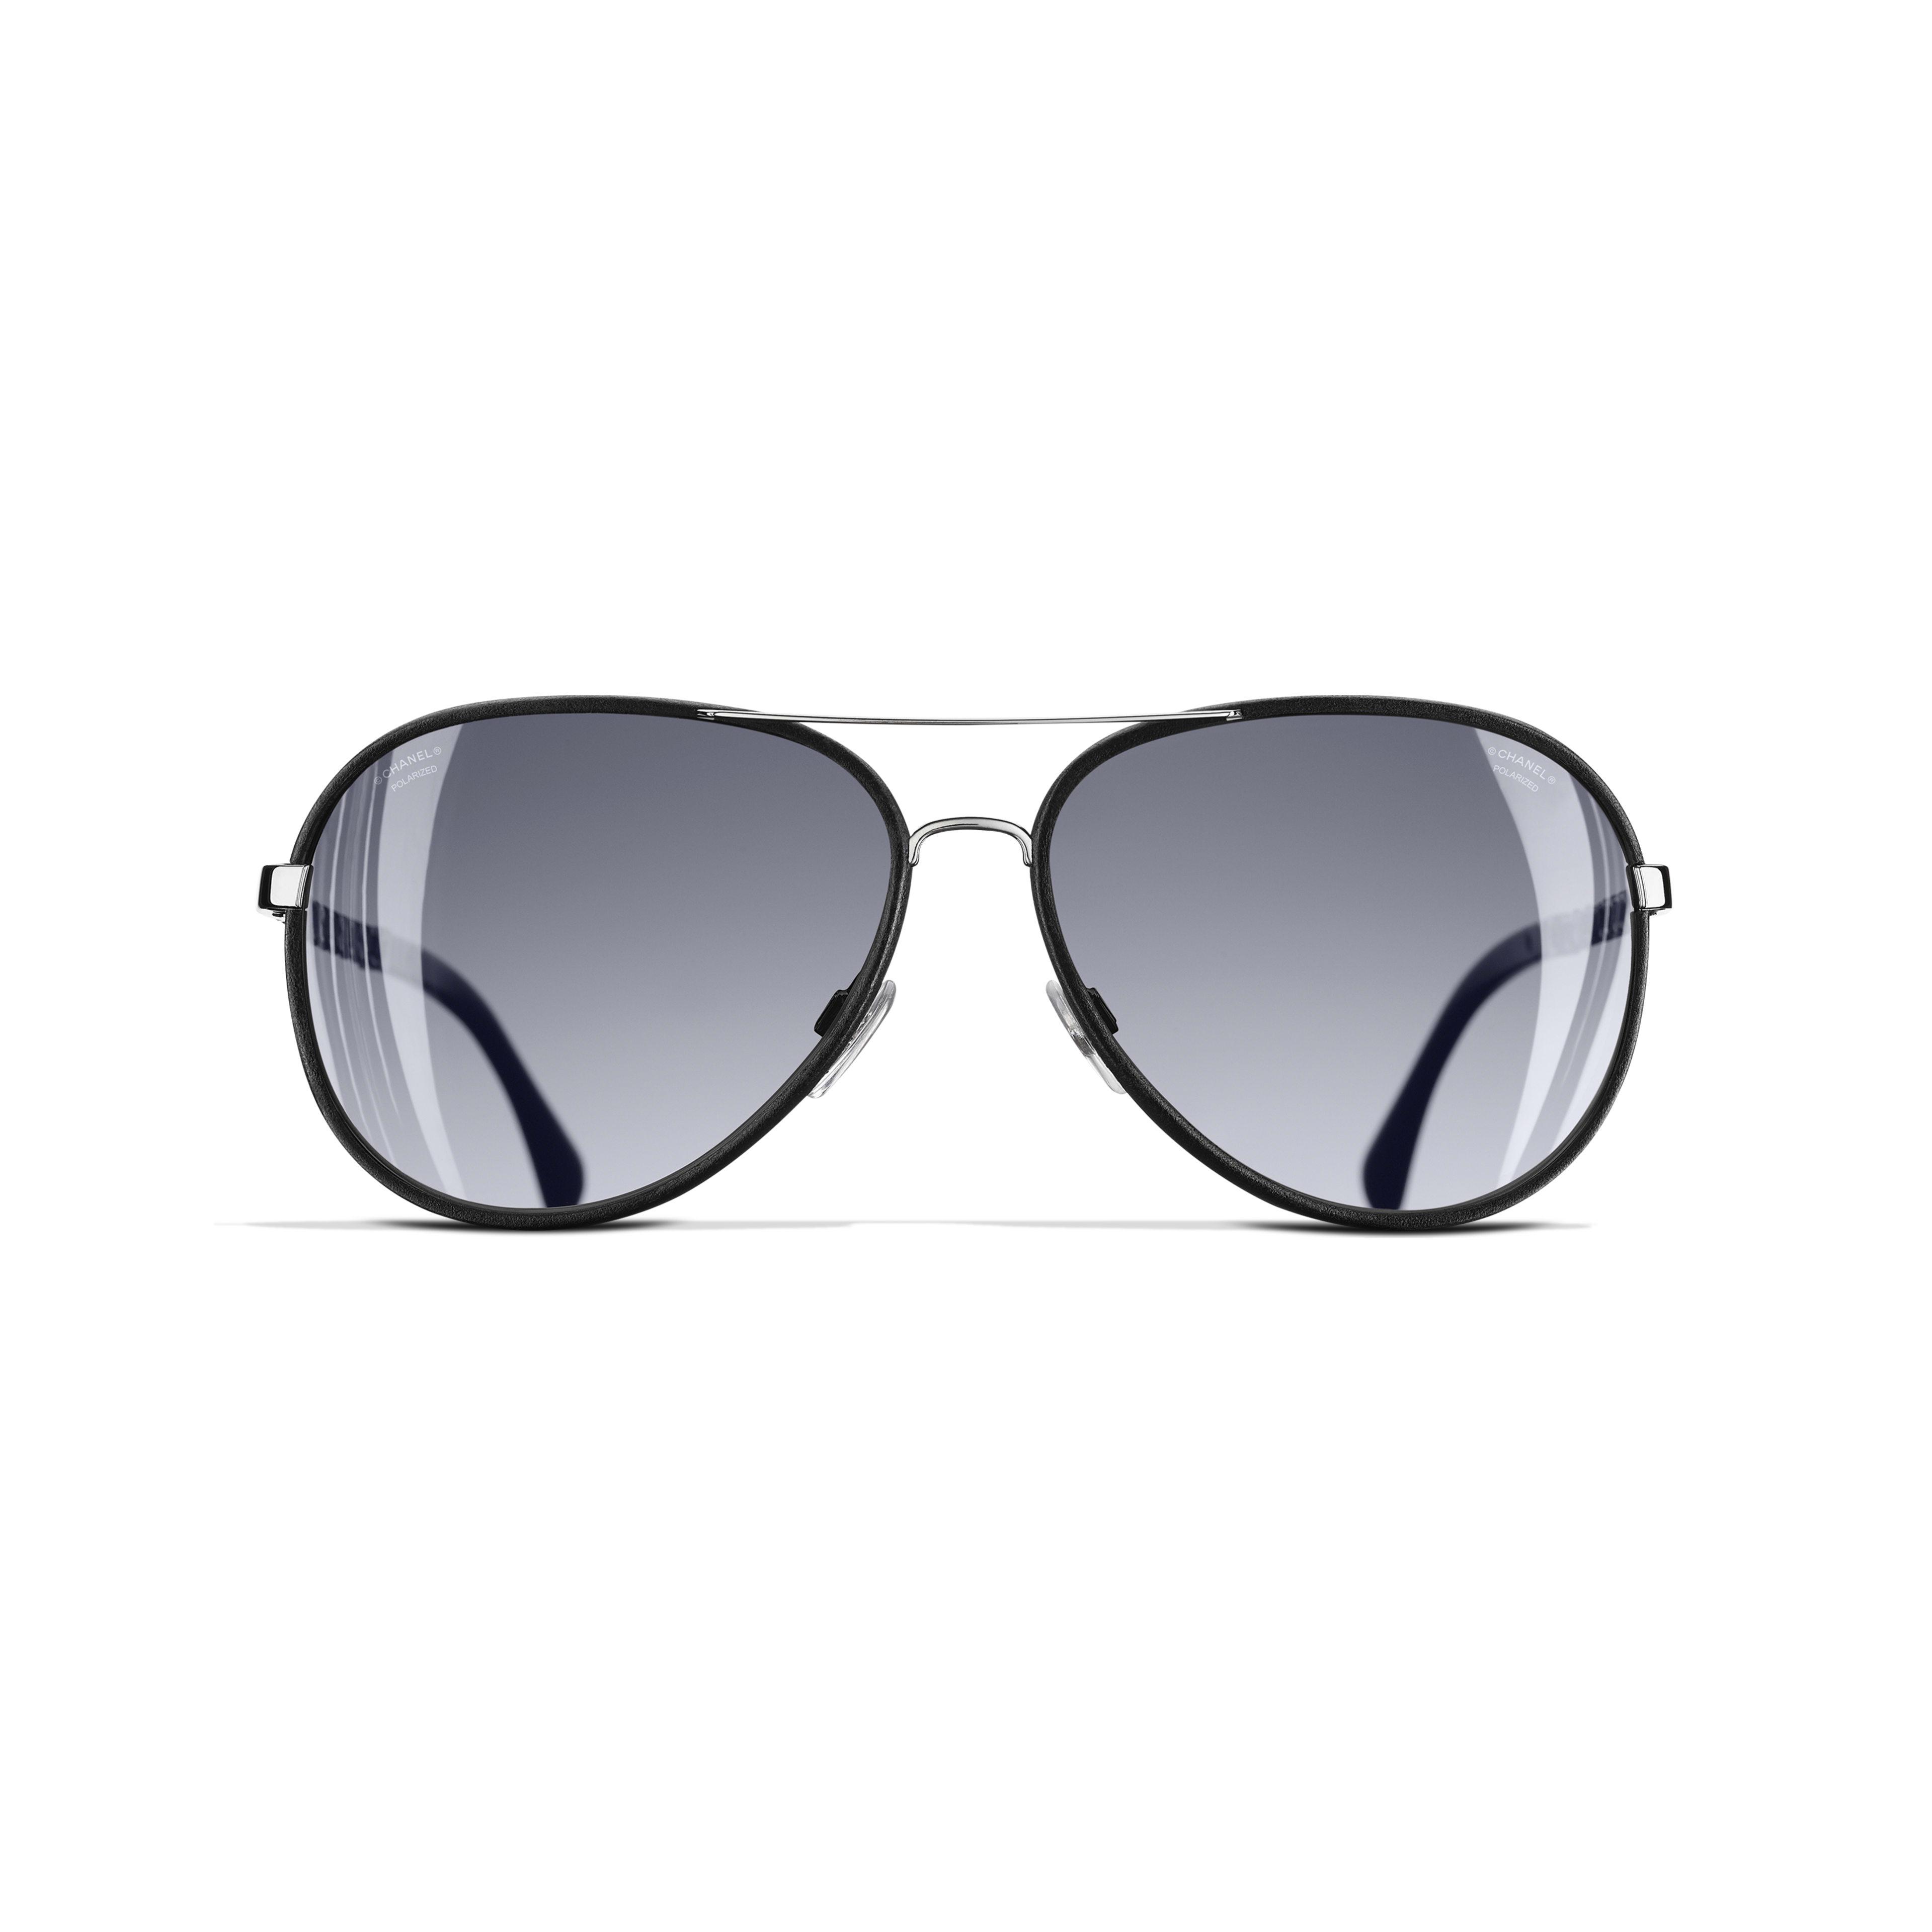 Pilot Sunglasses - Black - Metal & Calfskin - Polarized Lenses - Alternative view - see full sized version